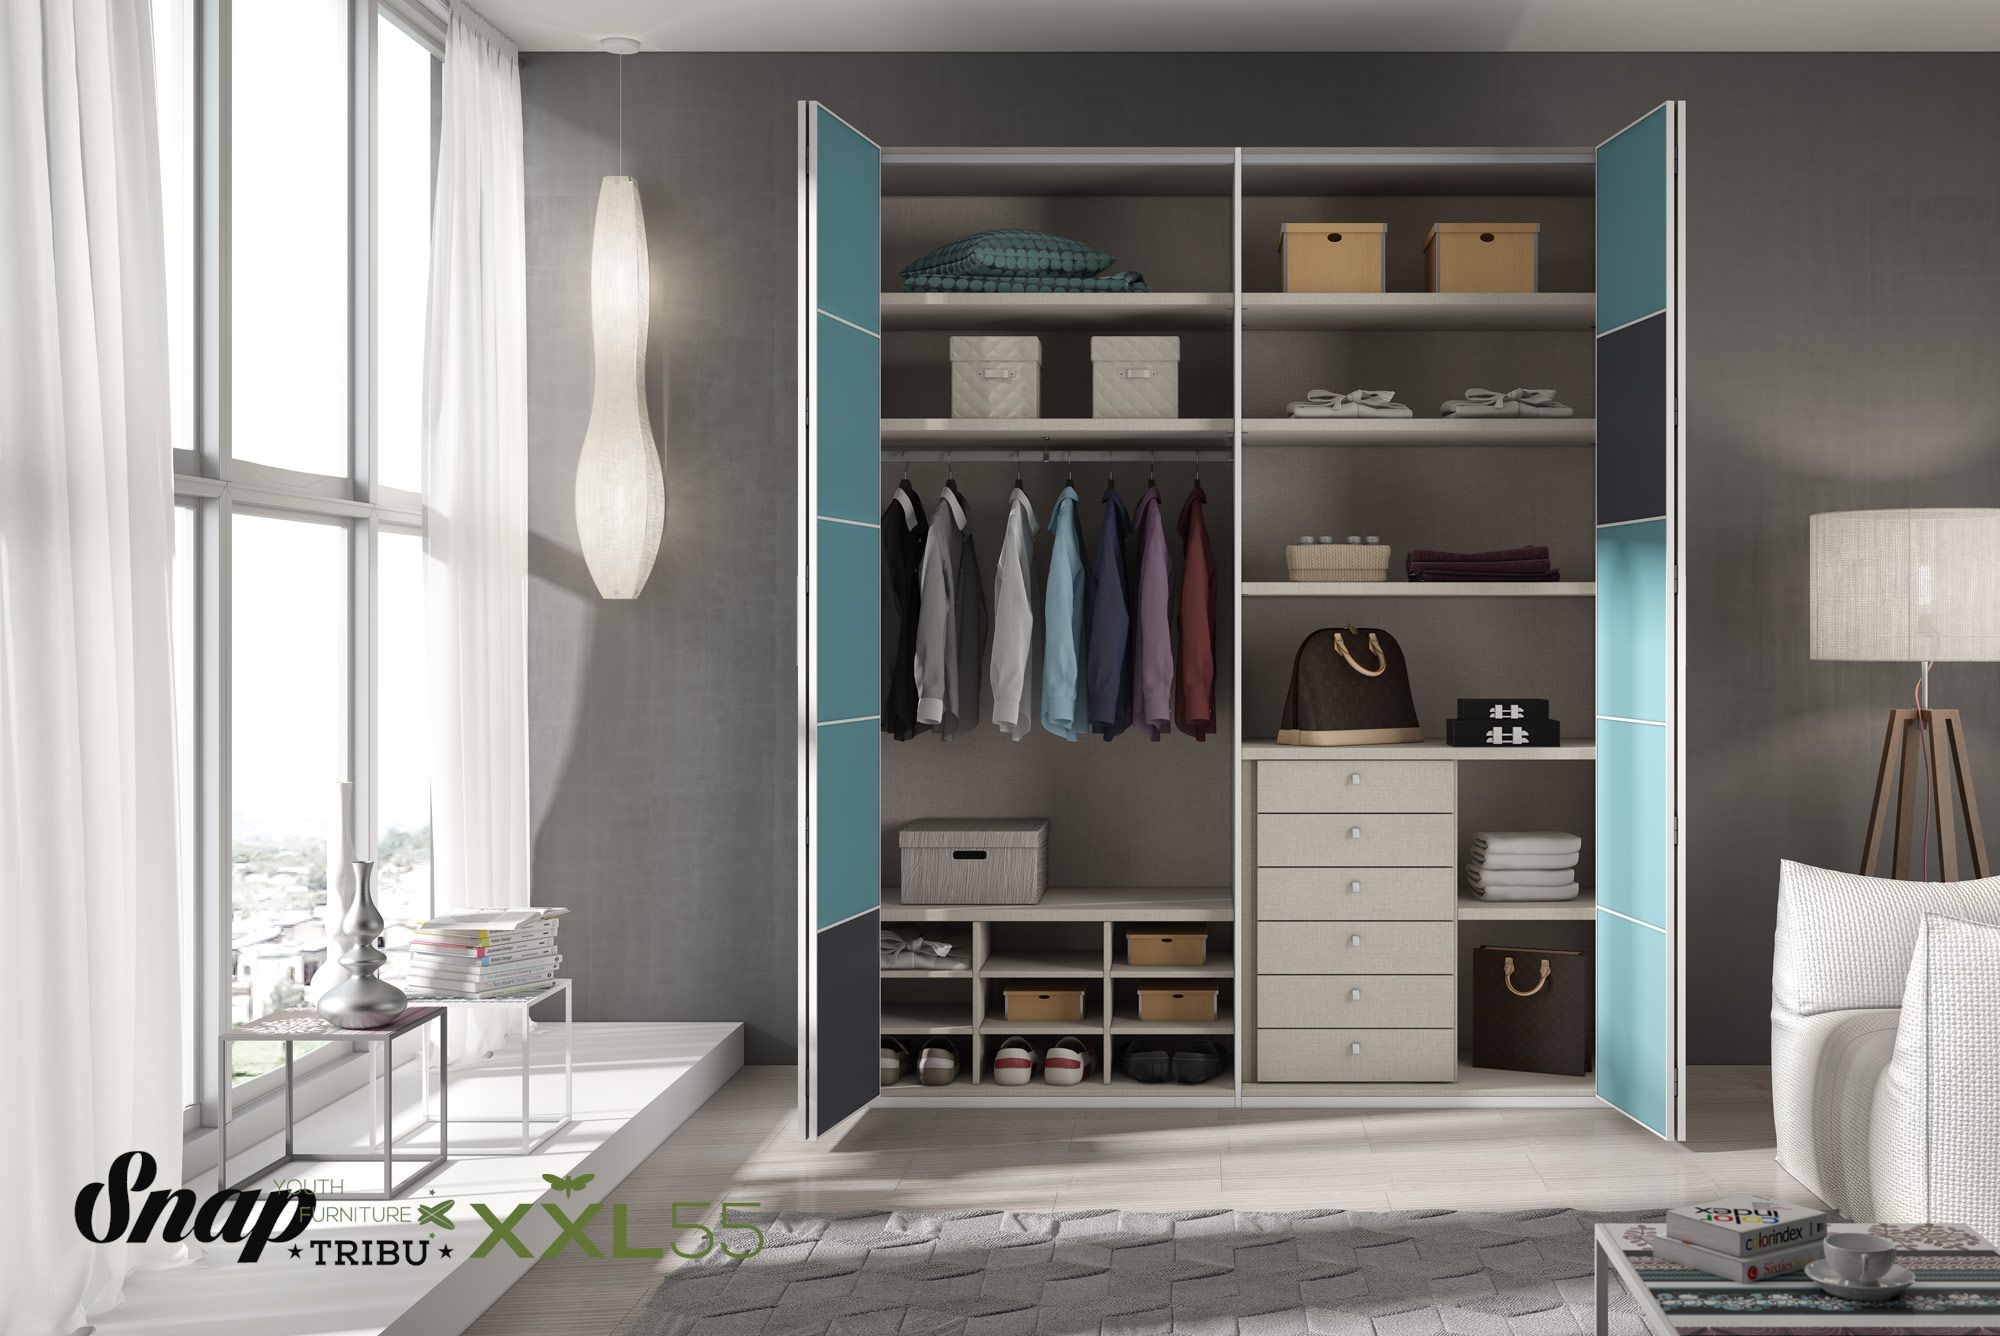 Tribu snap muebles hermida mueble juvenil xxl55 for Distribucion habitacion juvenil